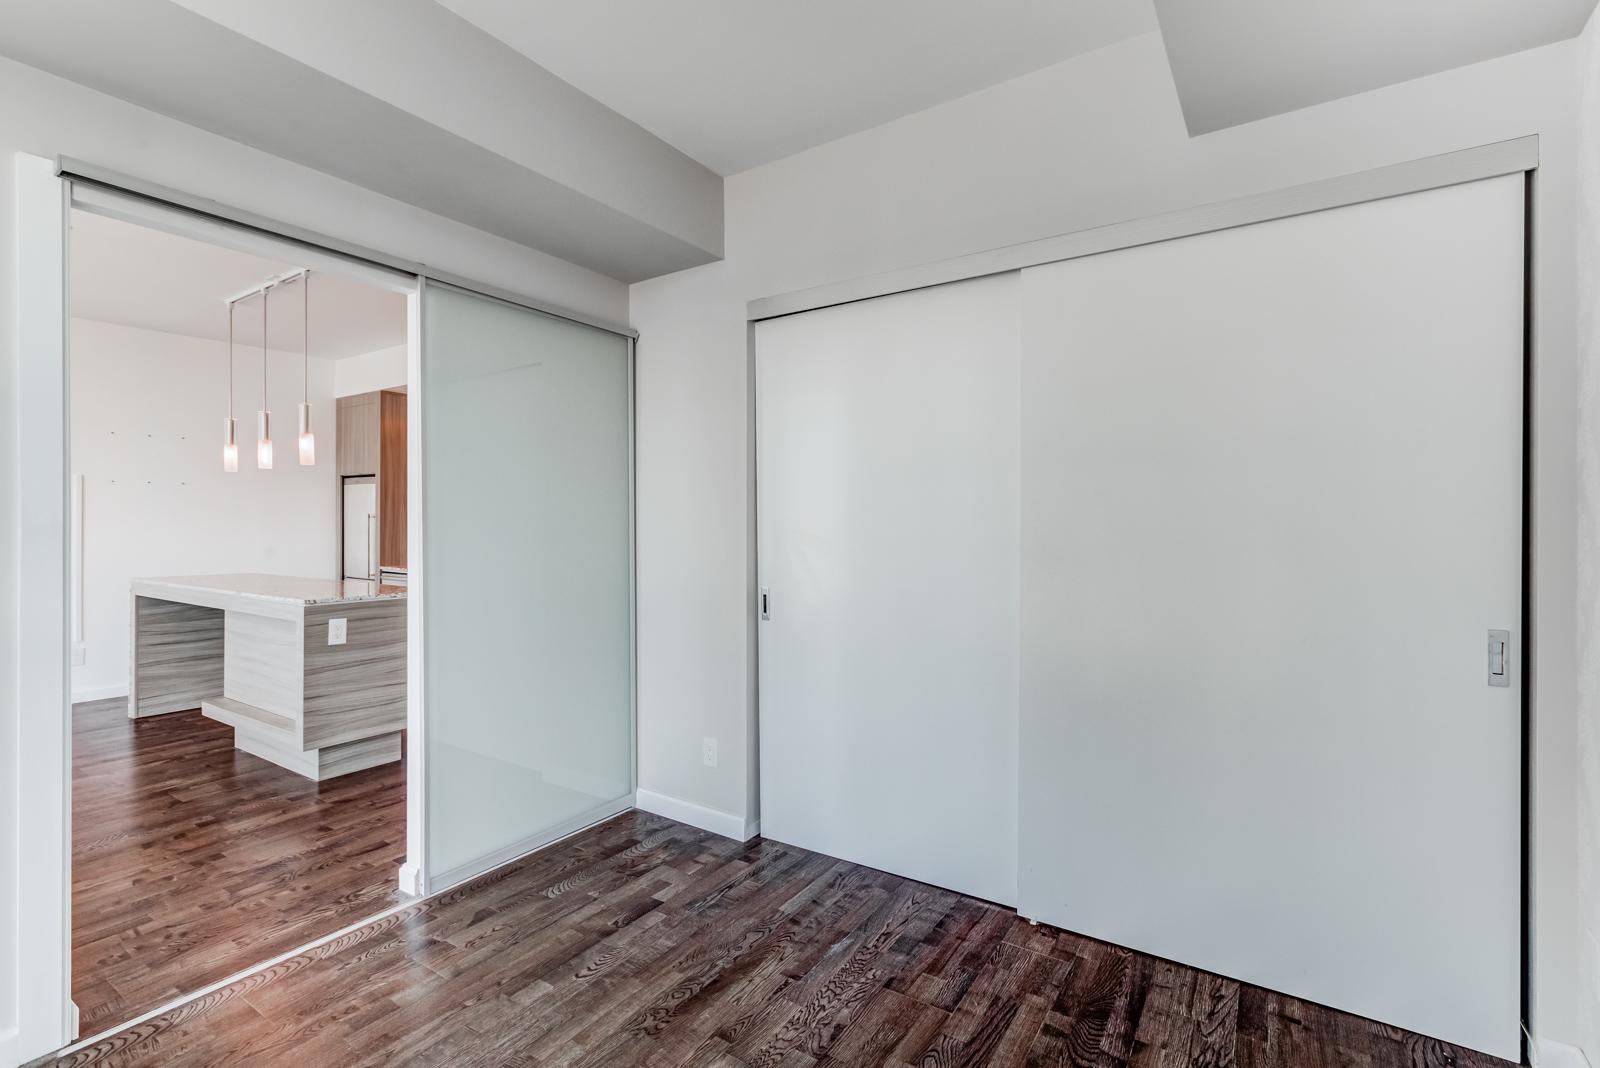 Master bedroom closet with dual gray sliding doors.